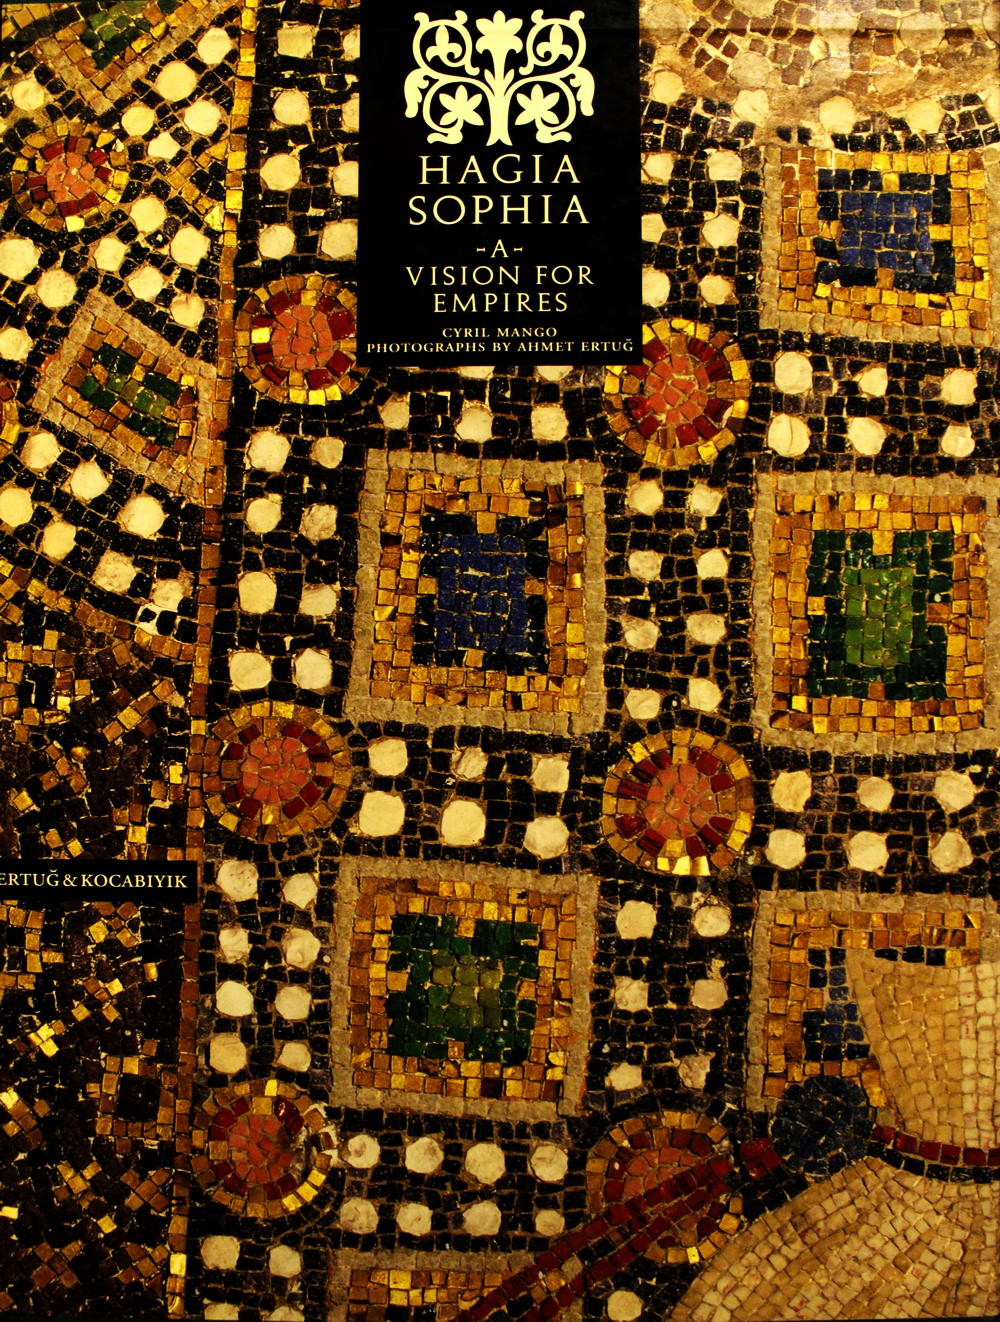 Hagia Sophia. O viziune asupra Imperiilor (Hagia Sophia, A Vision for Empires)